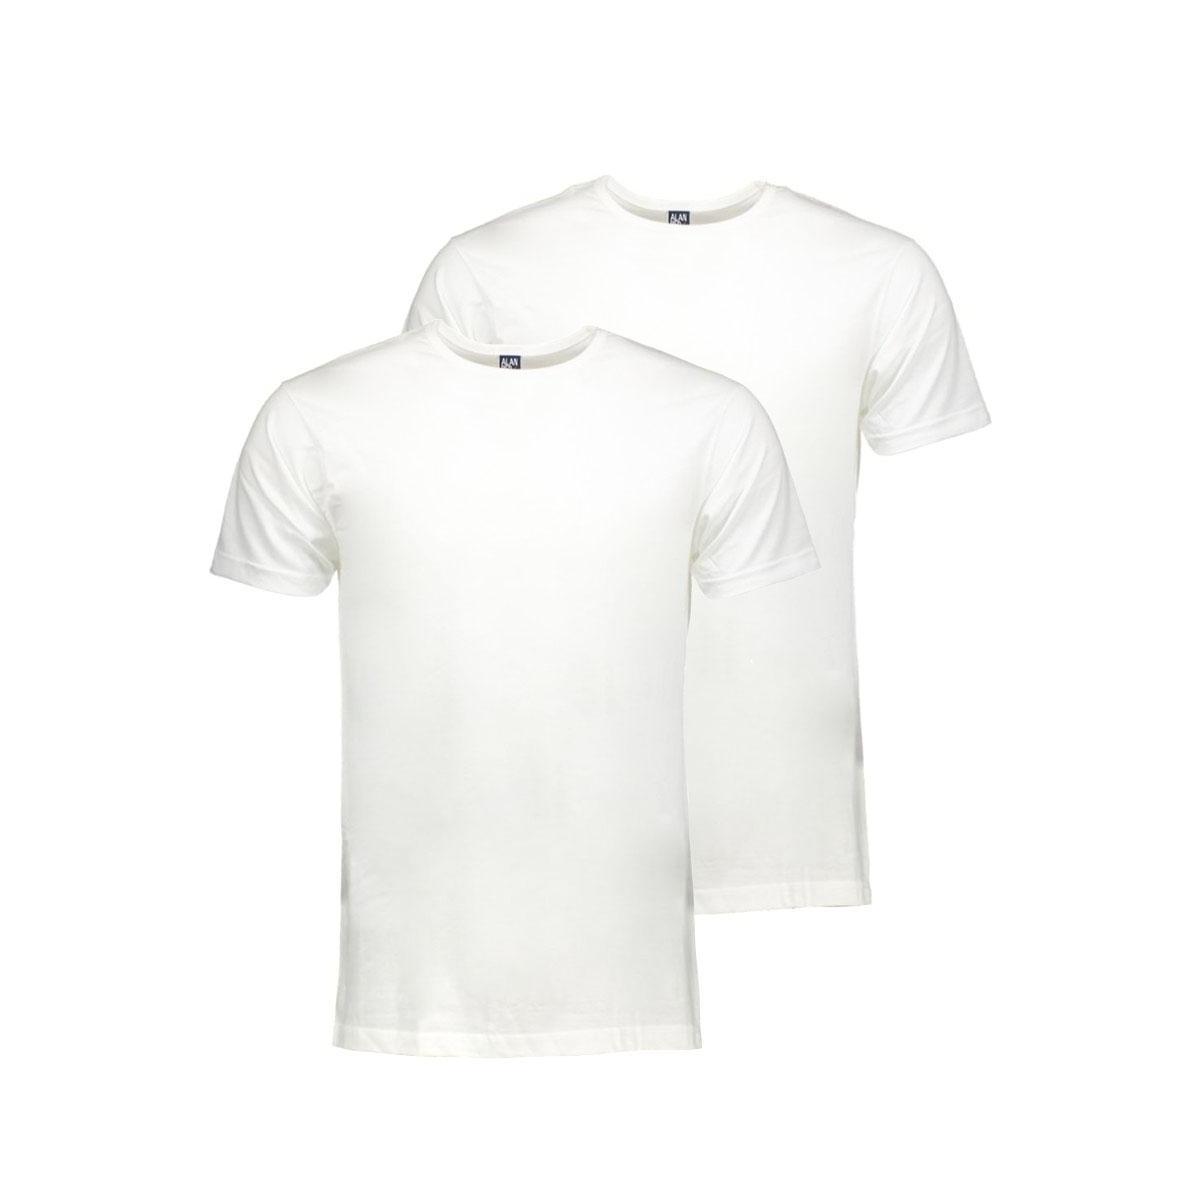 6680 ottowa alan red t-shirt 6